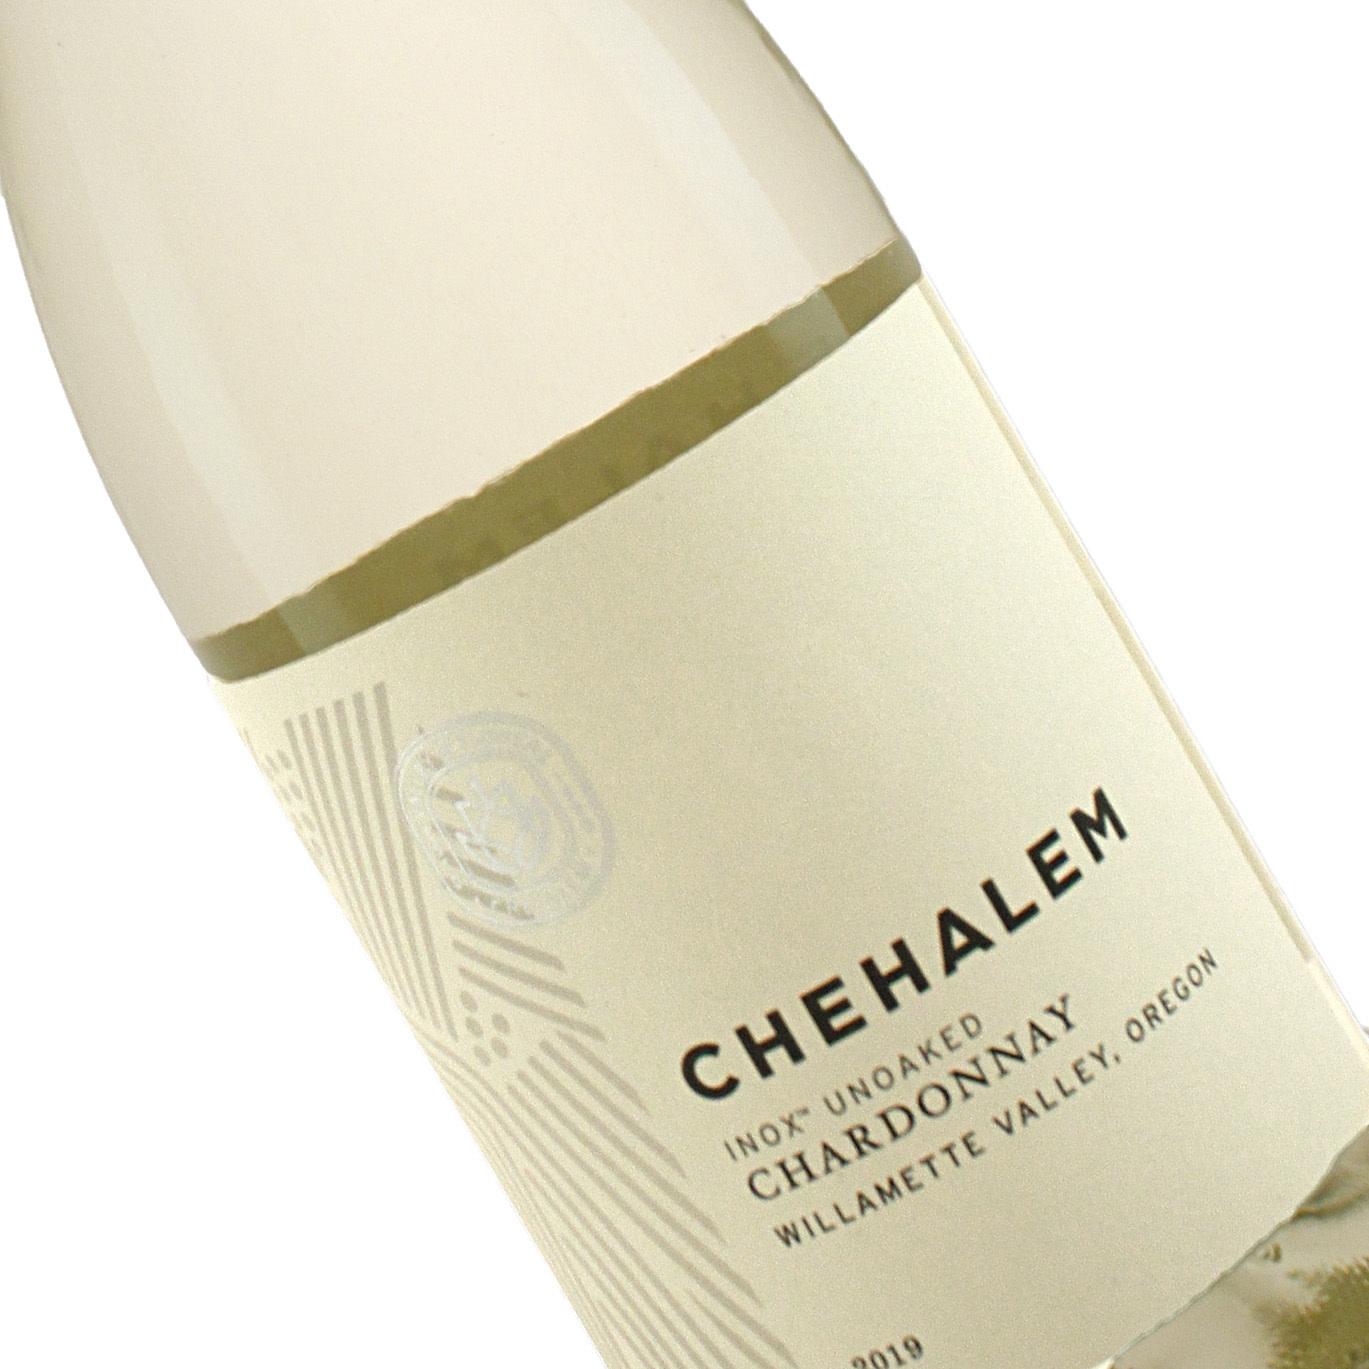 Chehalem 2019 Chardonnay, INOX Unoaked Willamette Valley, Oregon